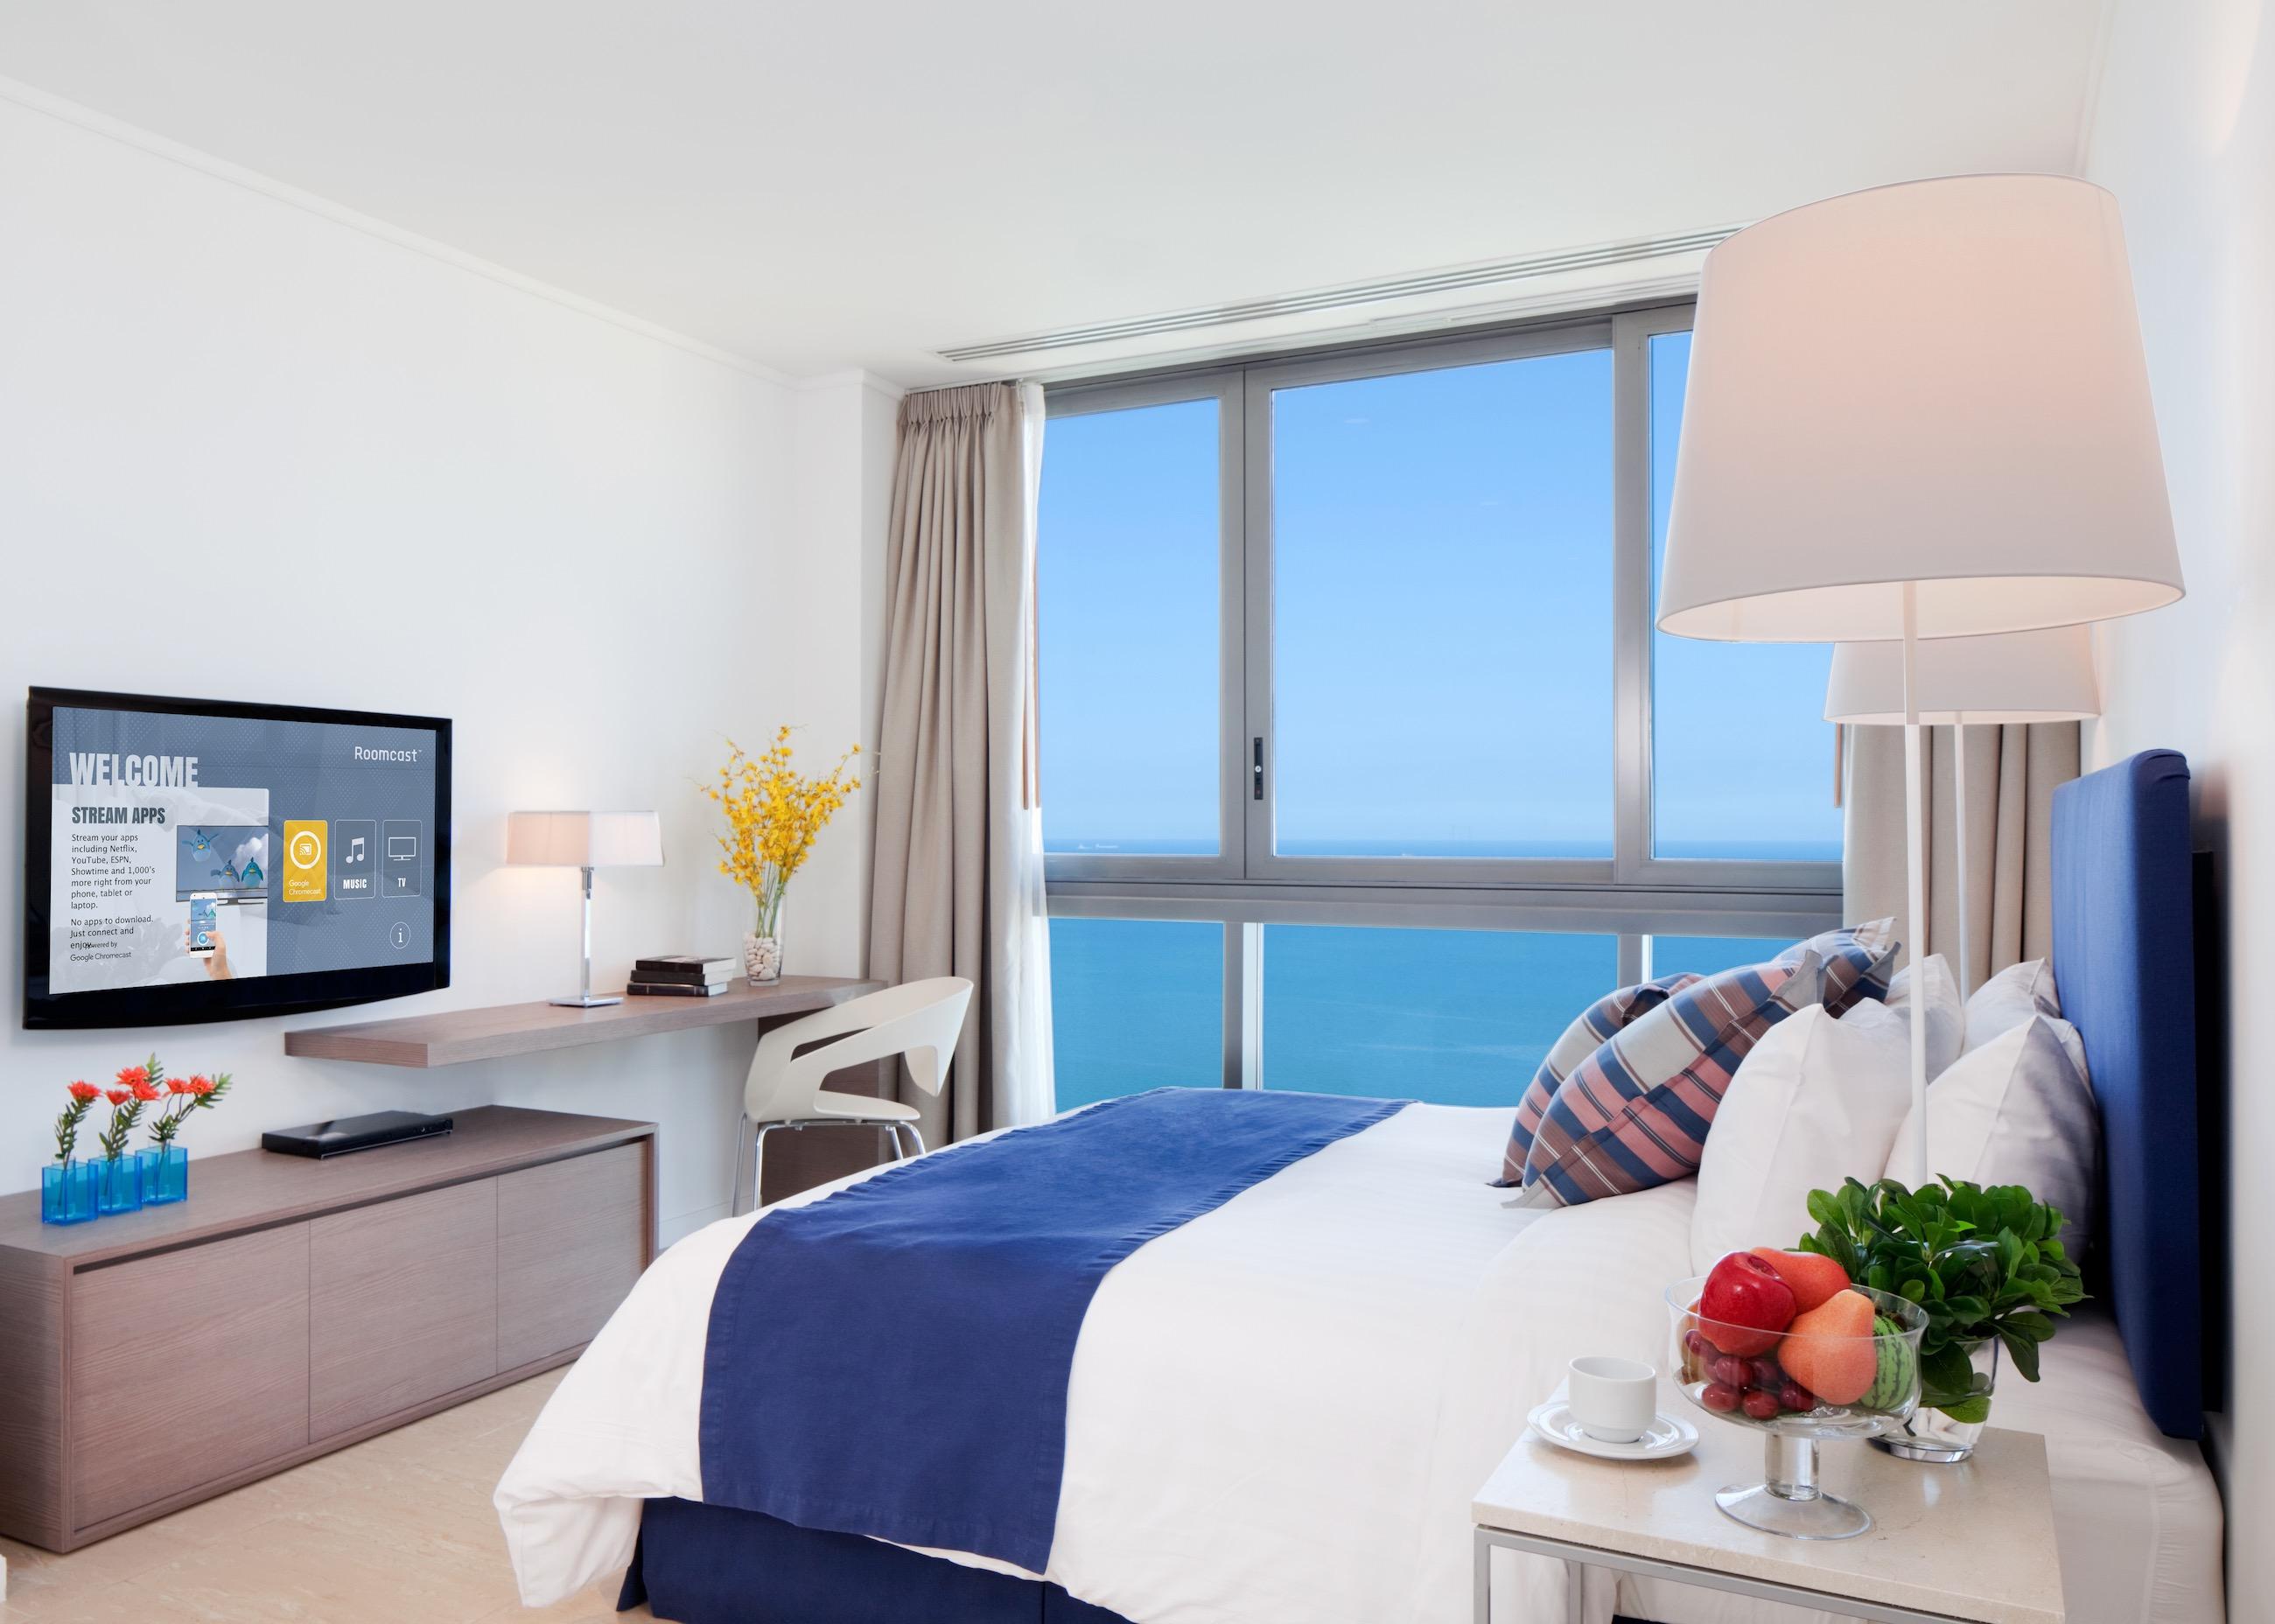 Roomcast™ - Google Chromecast for Hotels & Hospitality